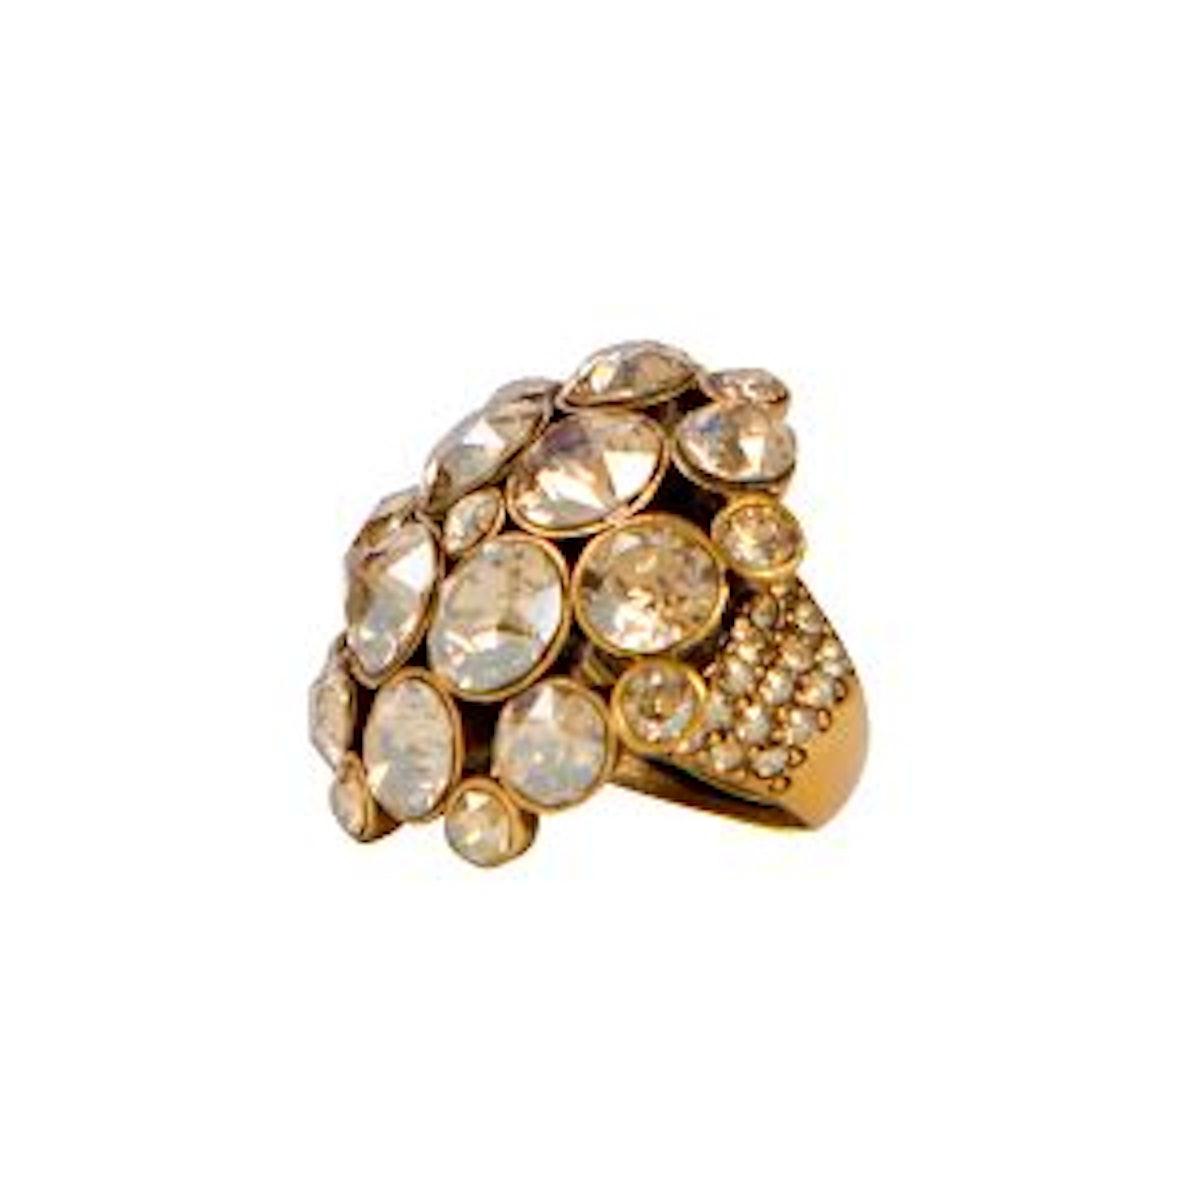 Swarovski Crystal Ring in Golden Shadow